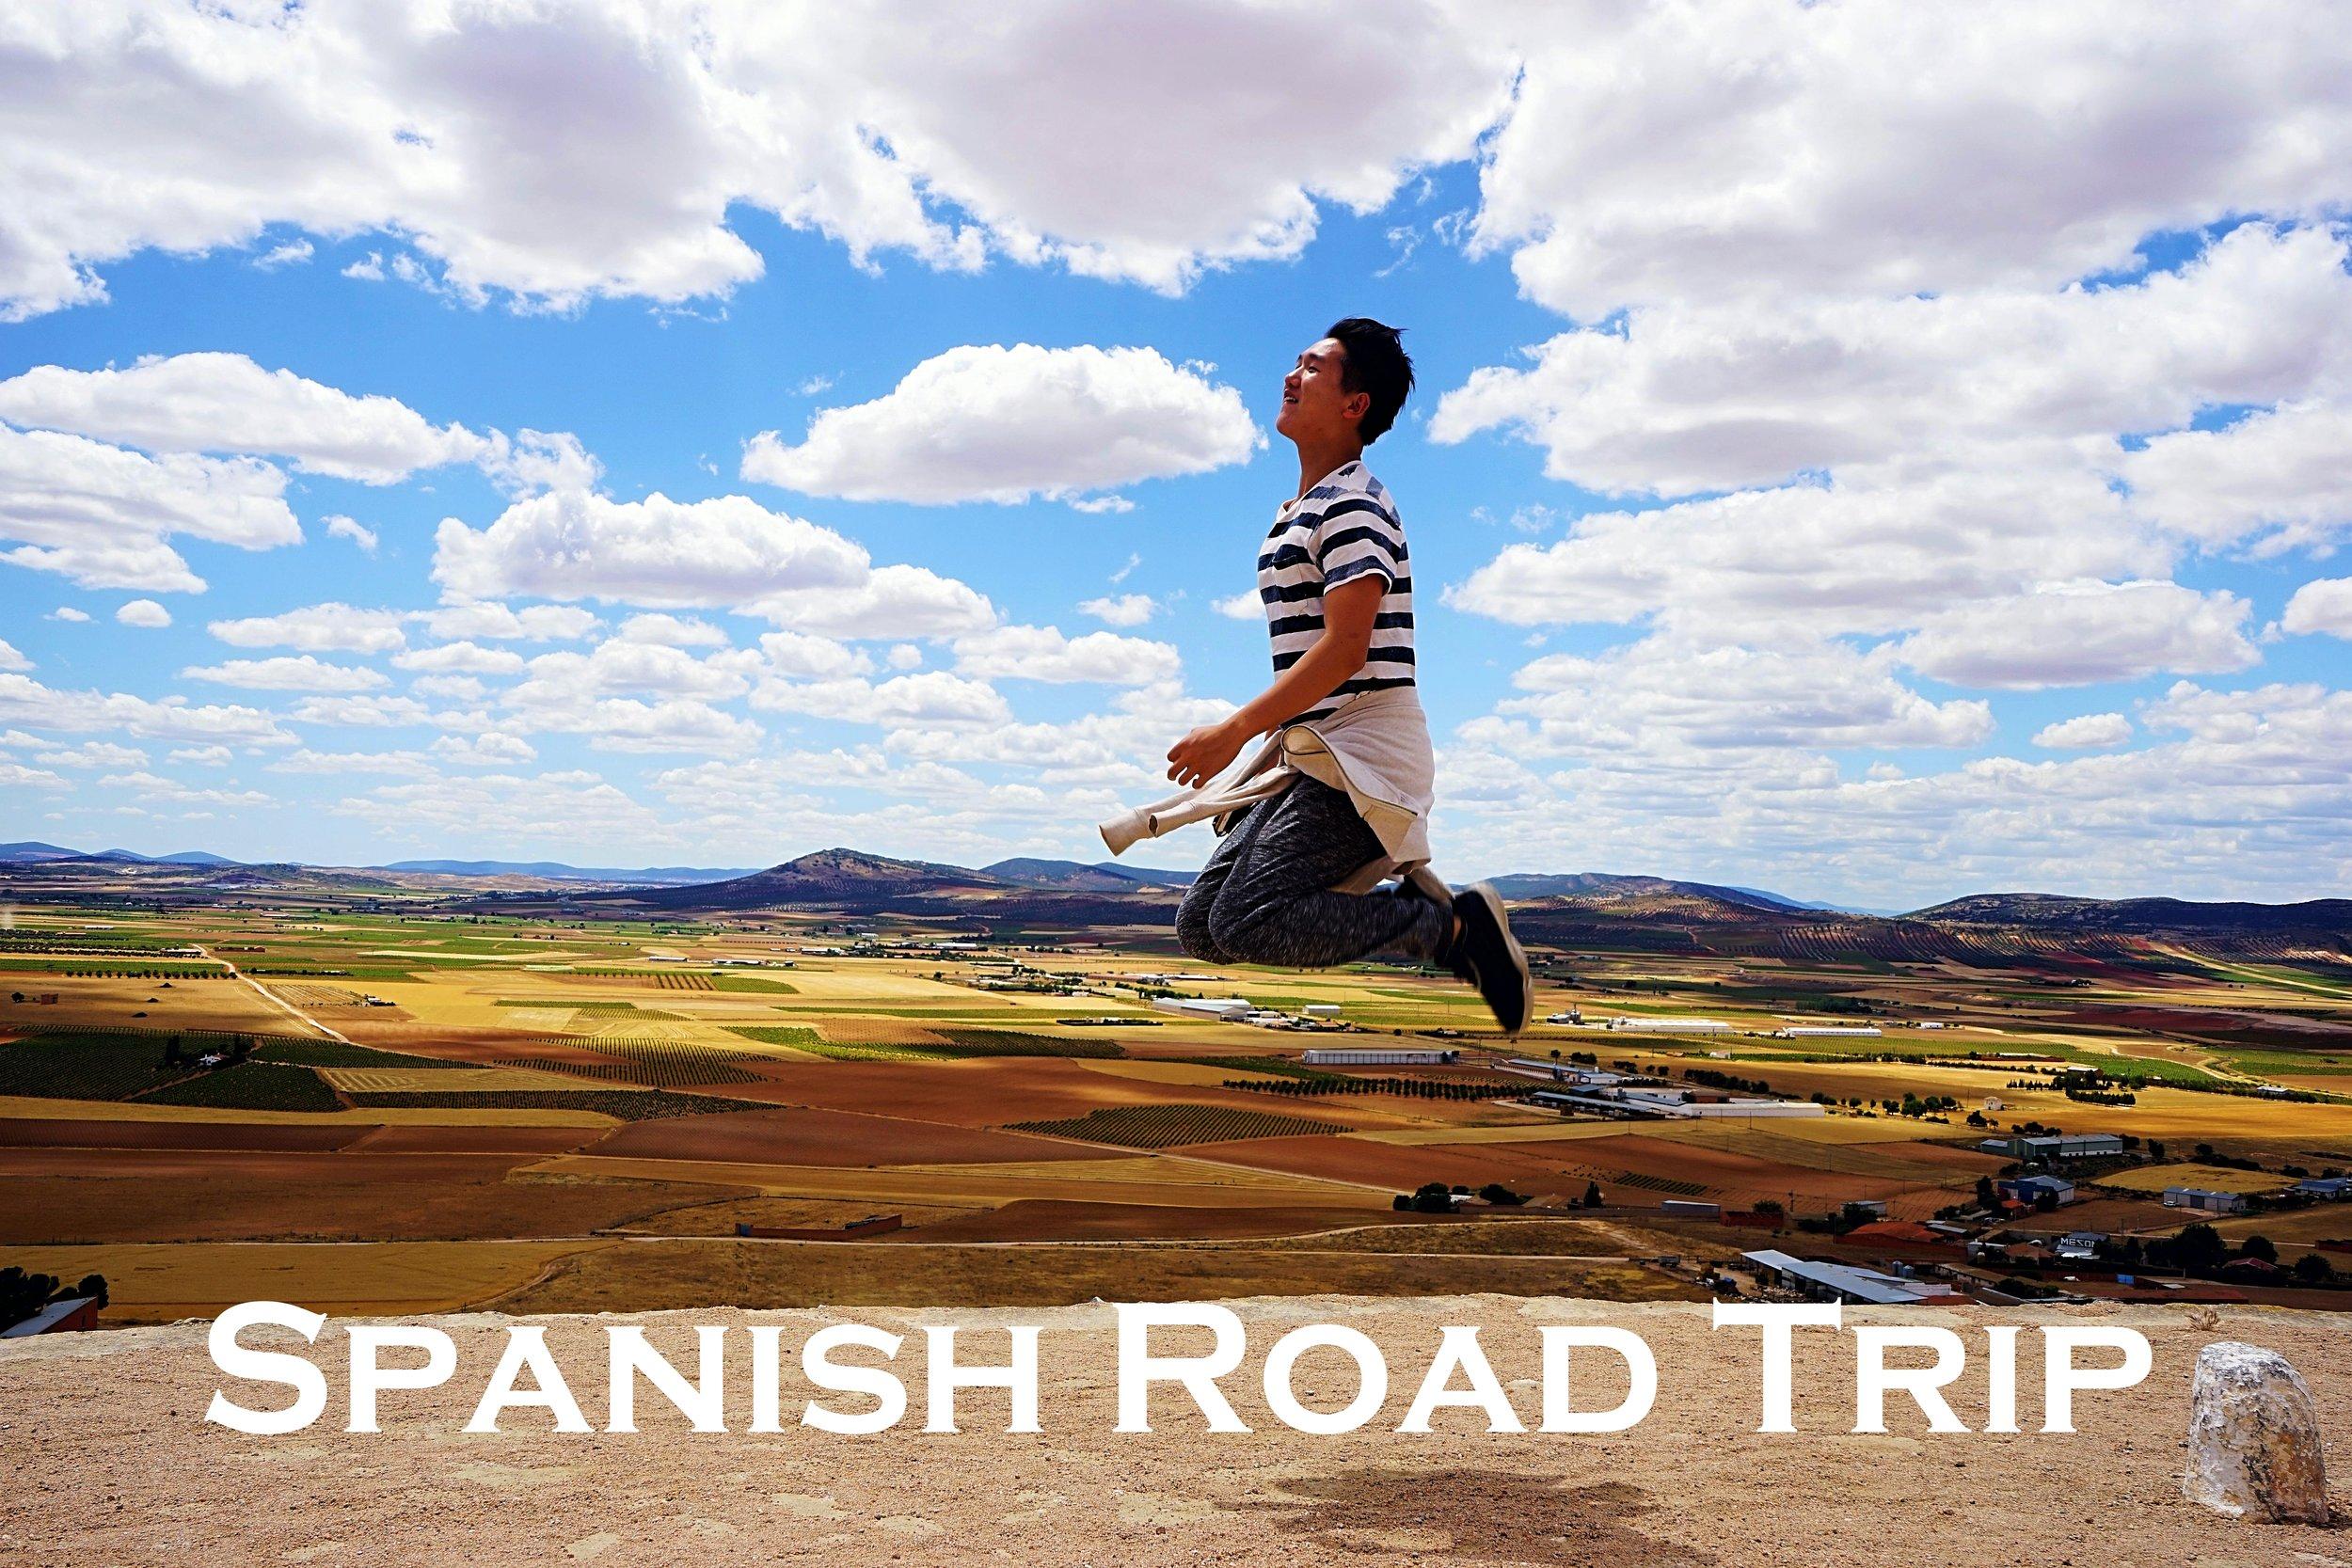 Spain Roadtrip Reviews By Jared